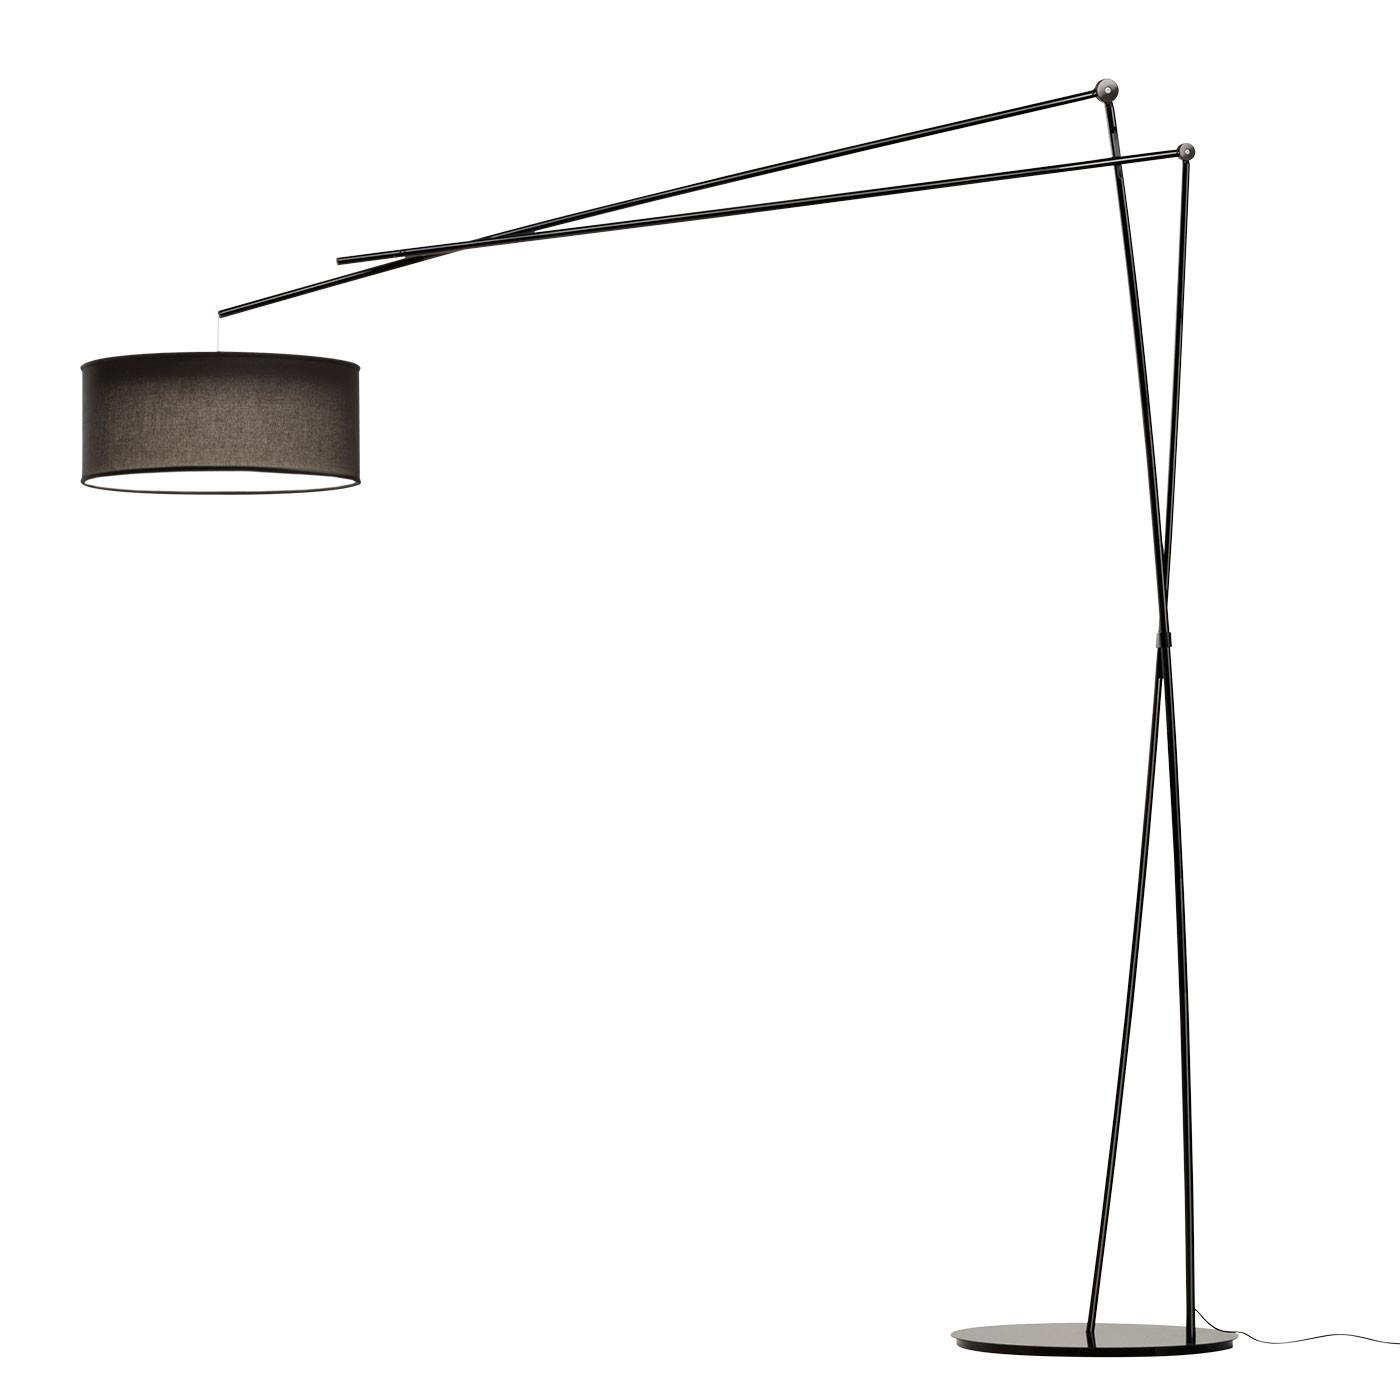 Prandina Effimera F5 LED mit Schirm